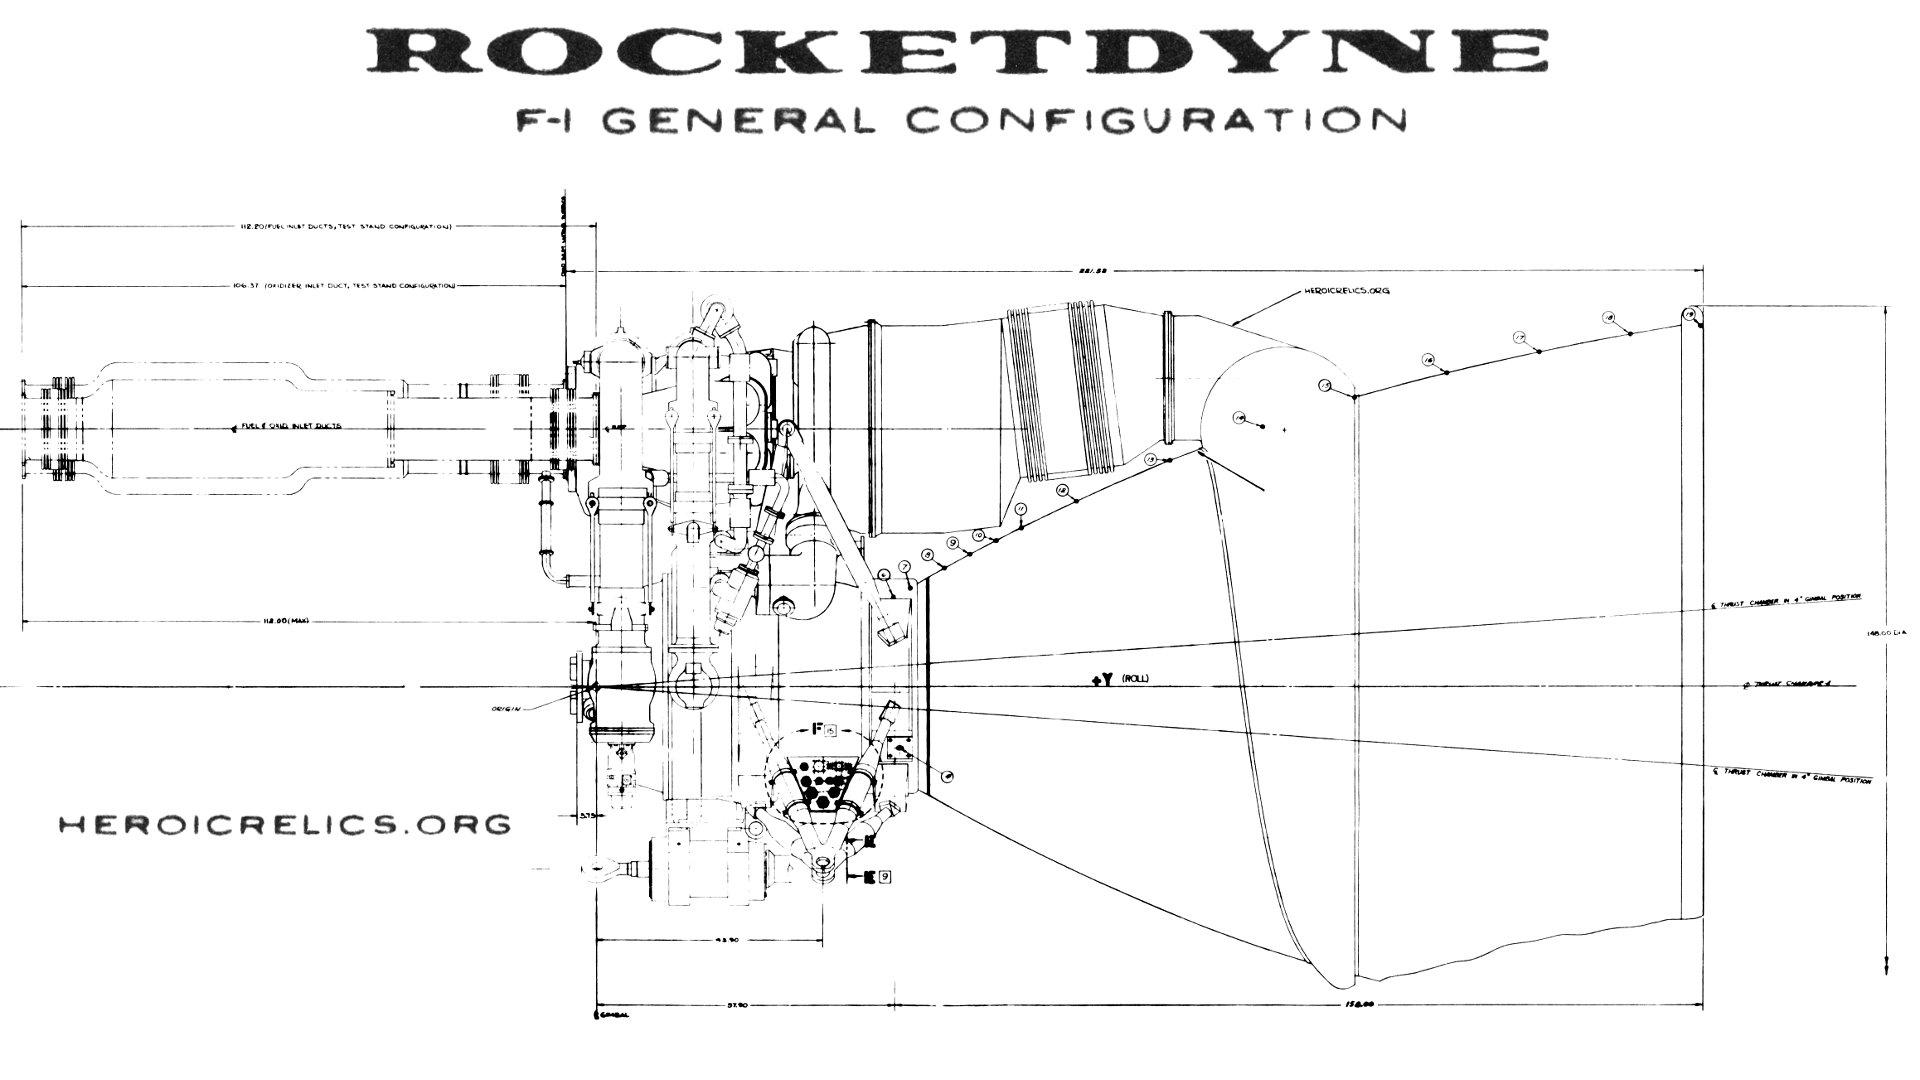 F-1 Rocket Engine General Configuration